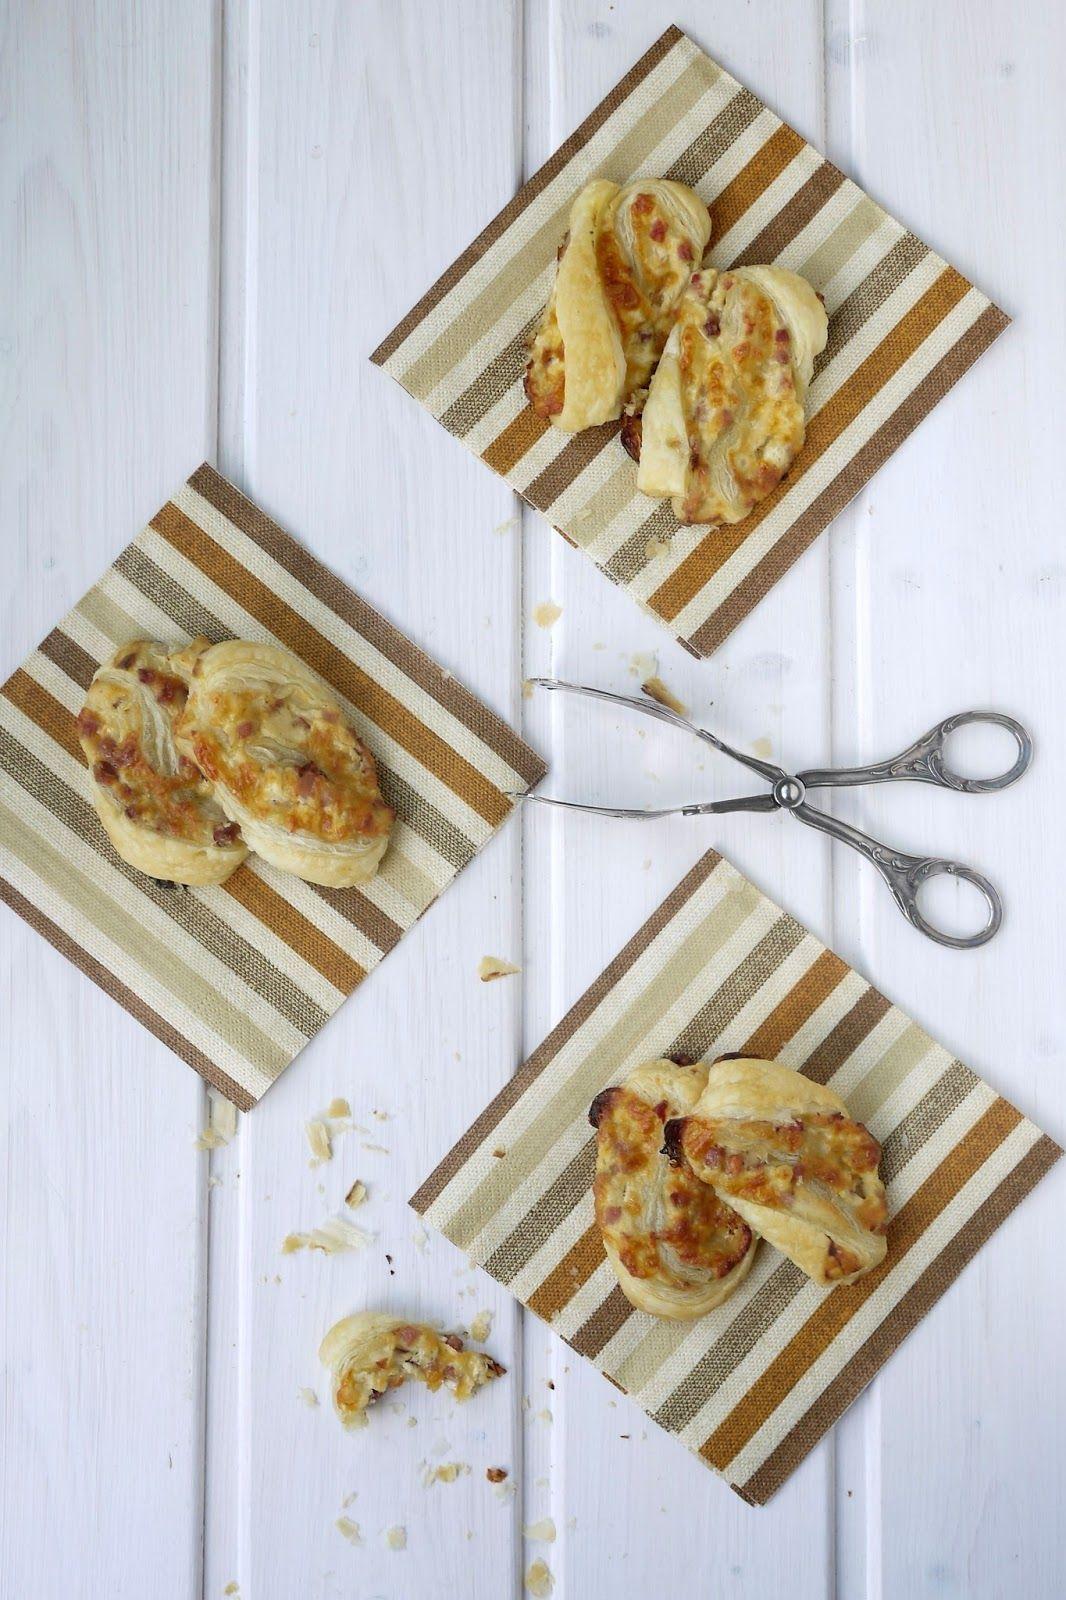 Blätterteiggebäck mit Käse und Speck | Food art, Snacks and Foods